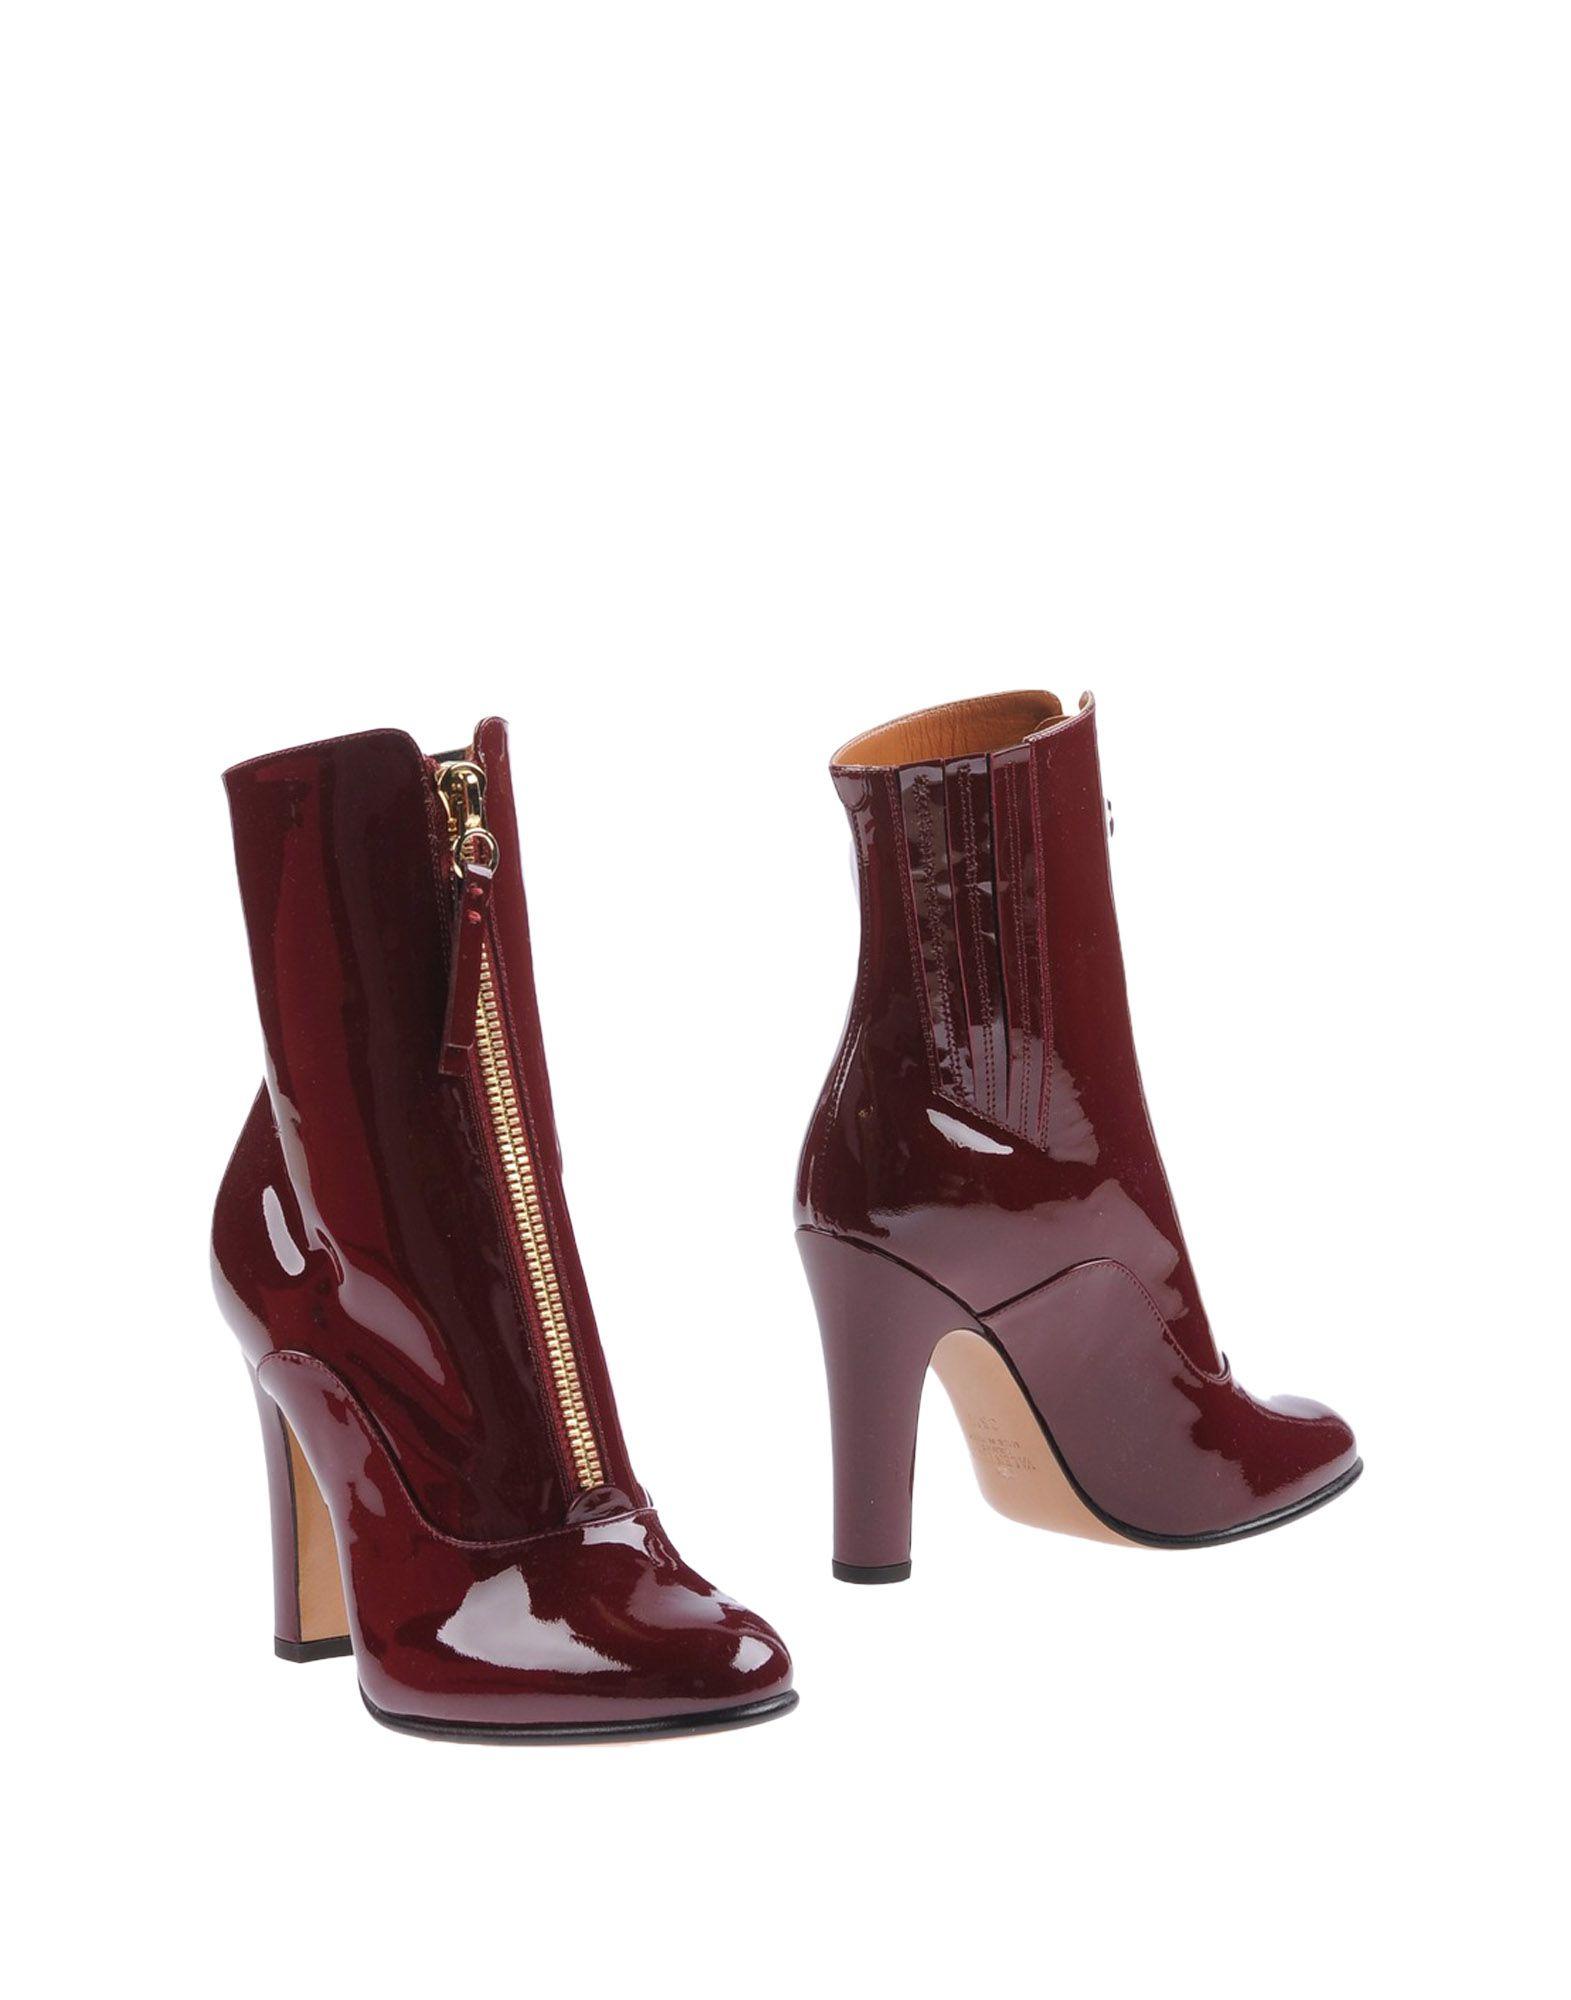 Valentino Garavani Ankle Boot - Women